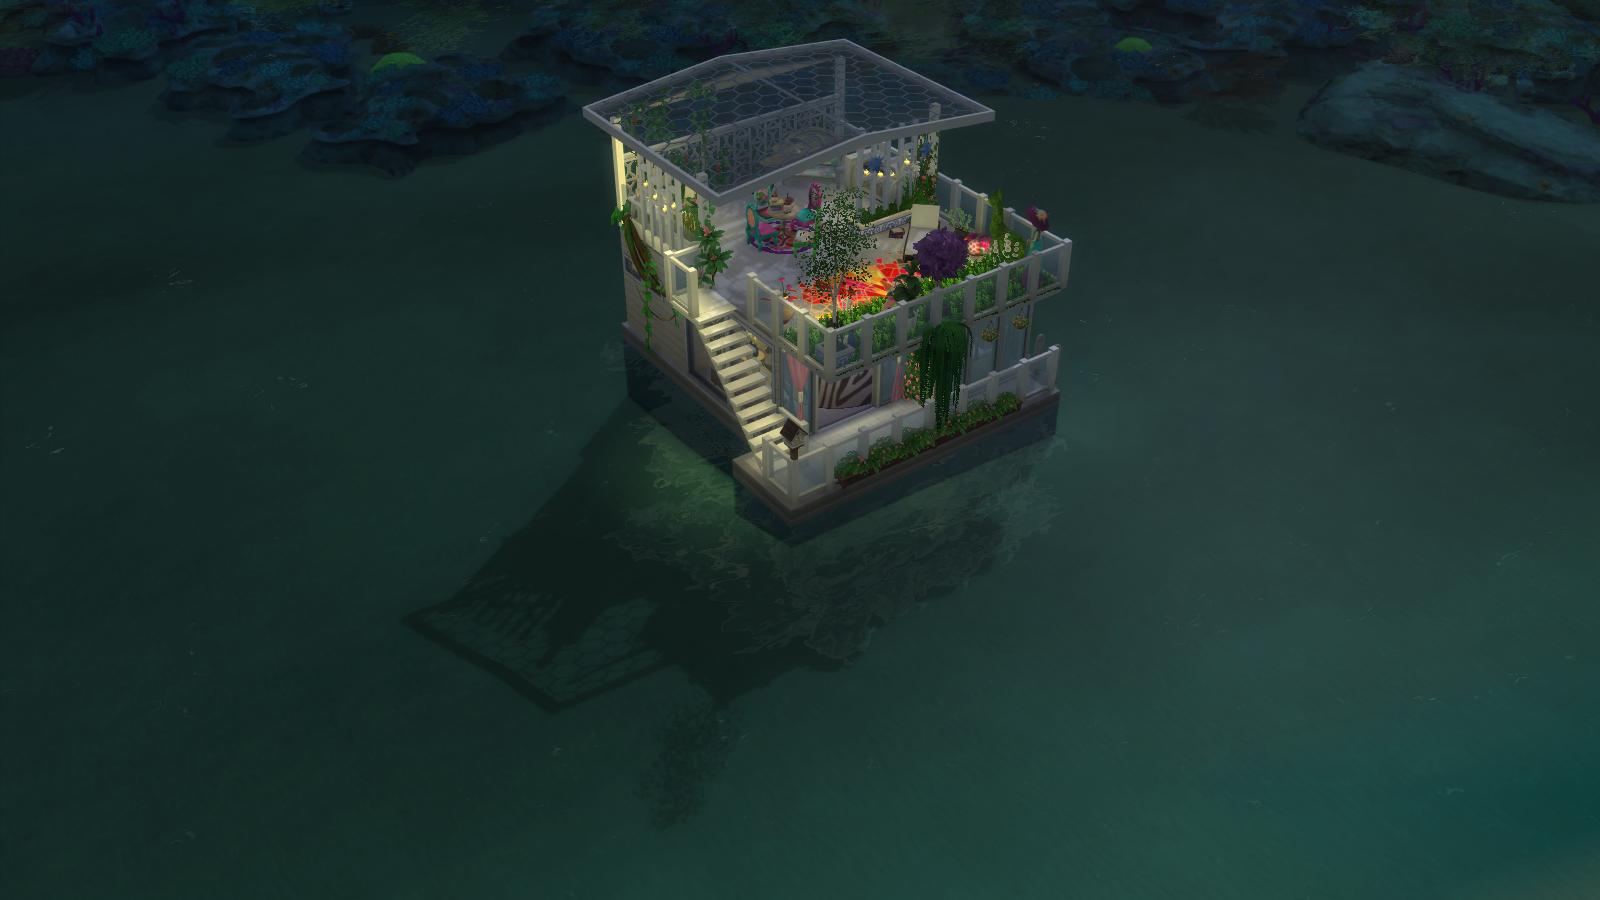 Garden House Boat for Sims 4